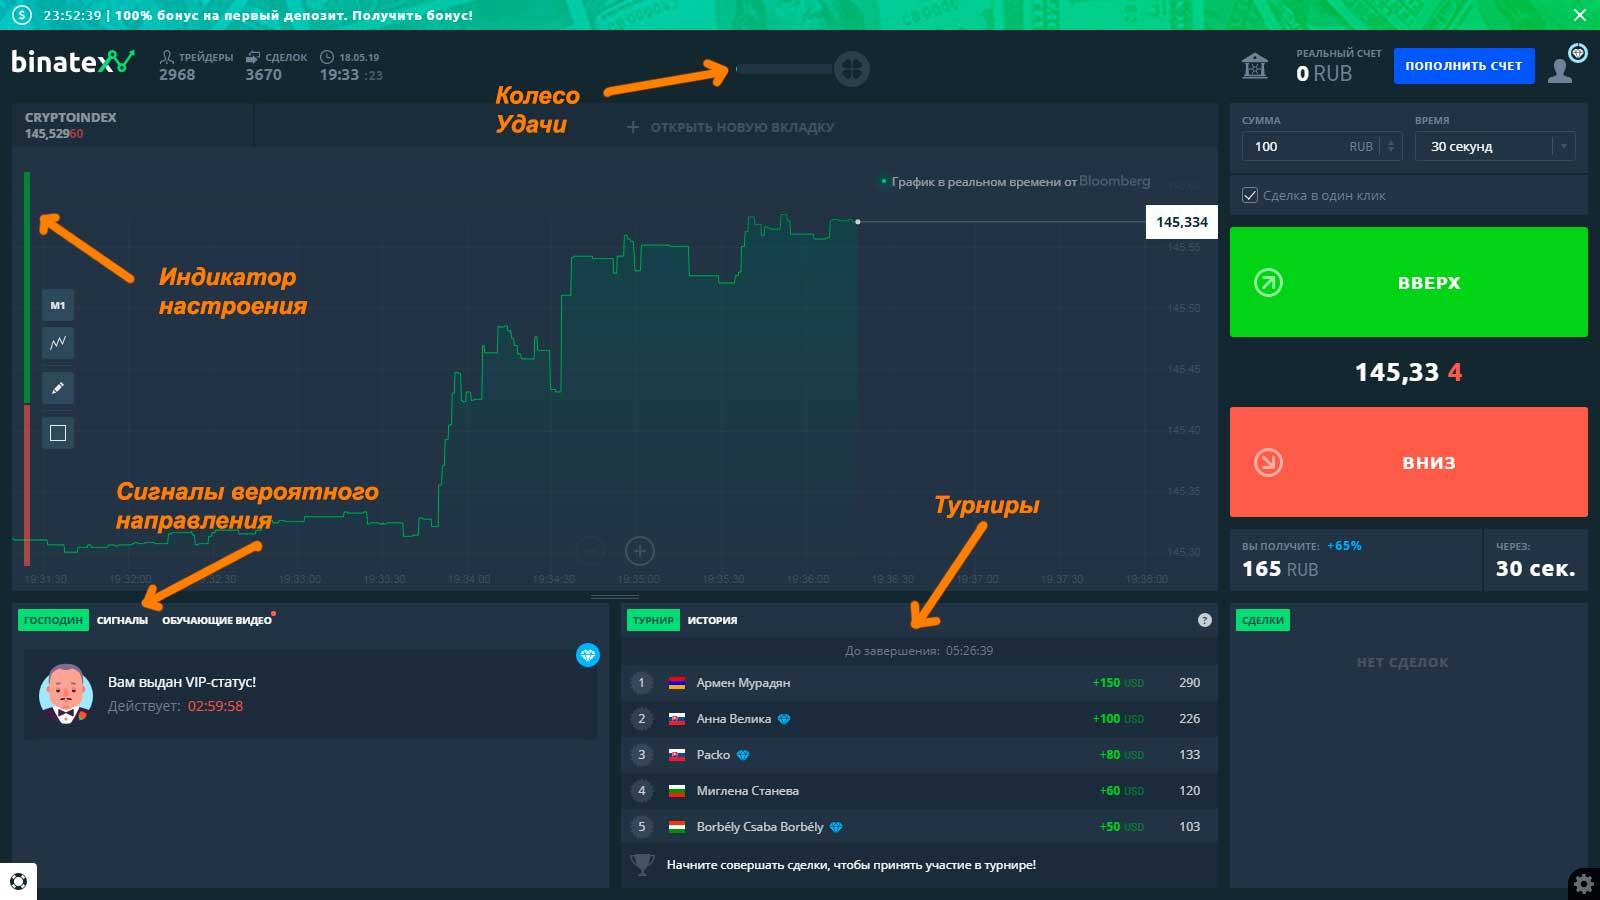 торговая платформа binatex